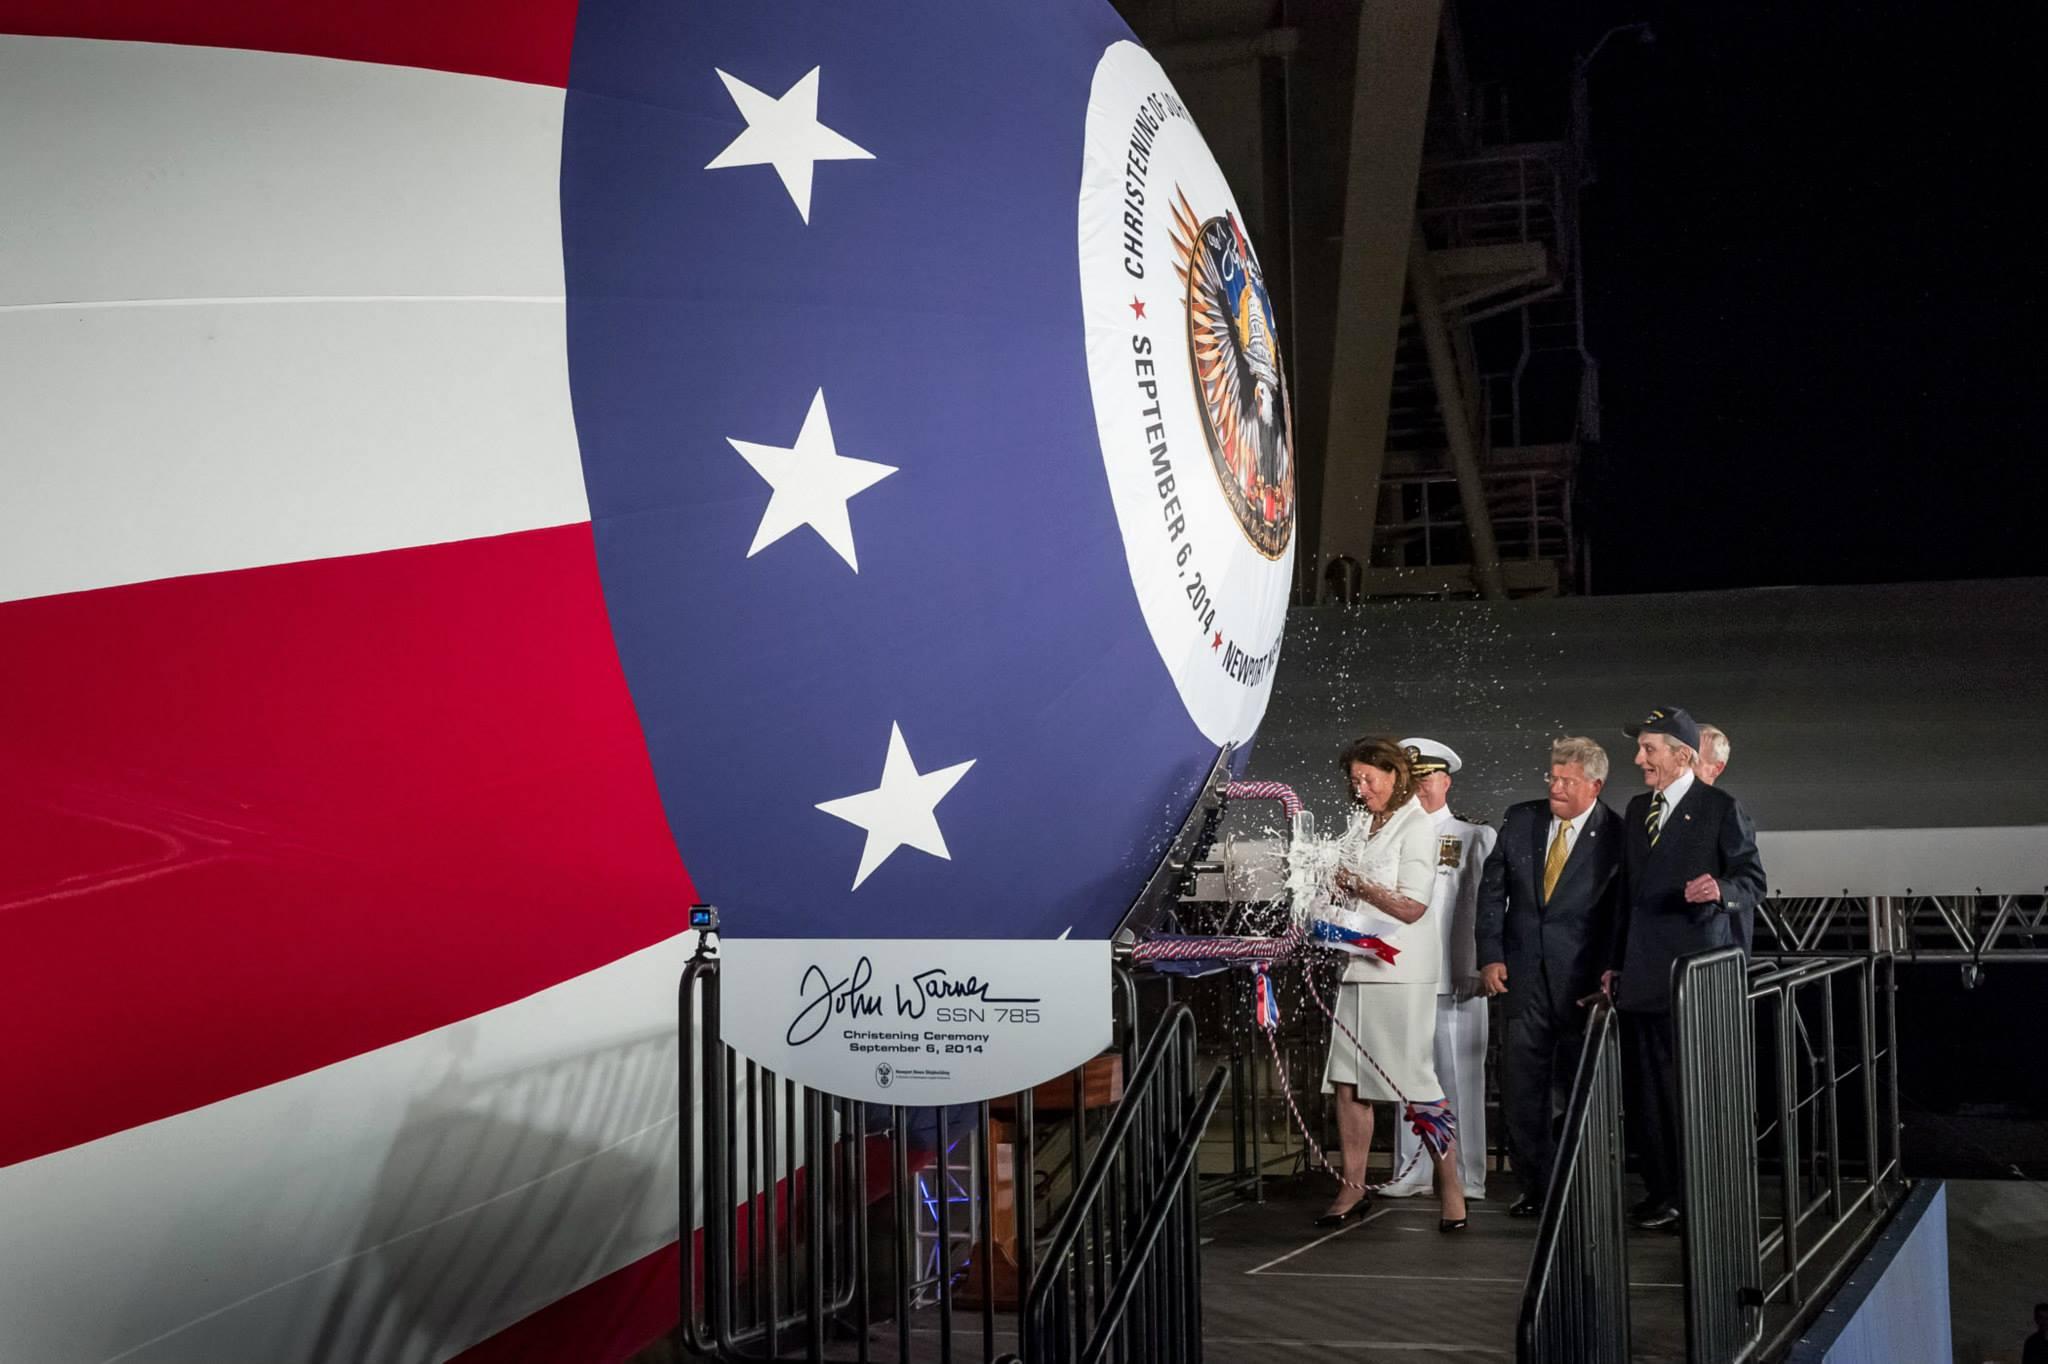 USS JOHN WARNER SSN-785 Christening Bild: Huntington Ingalls Industries